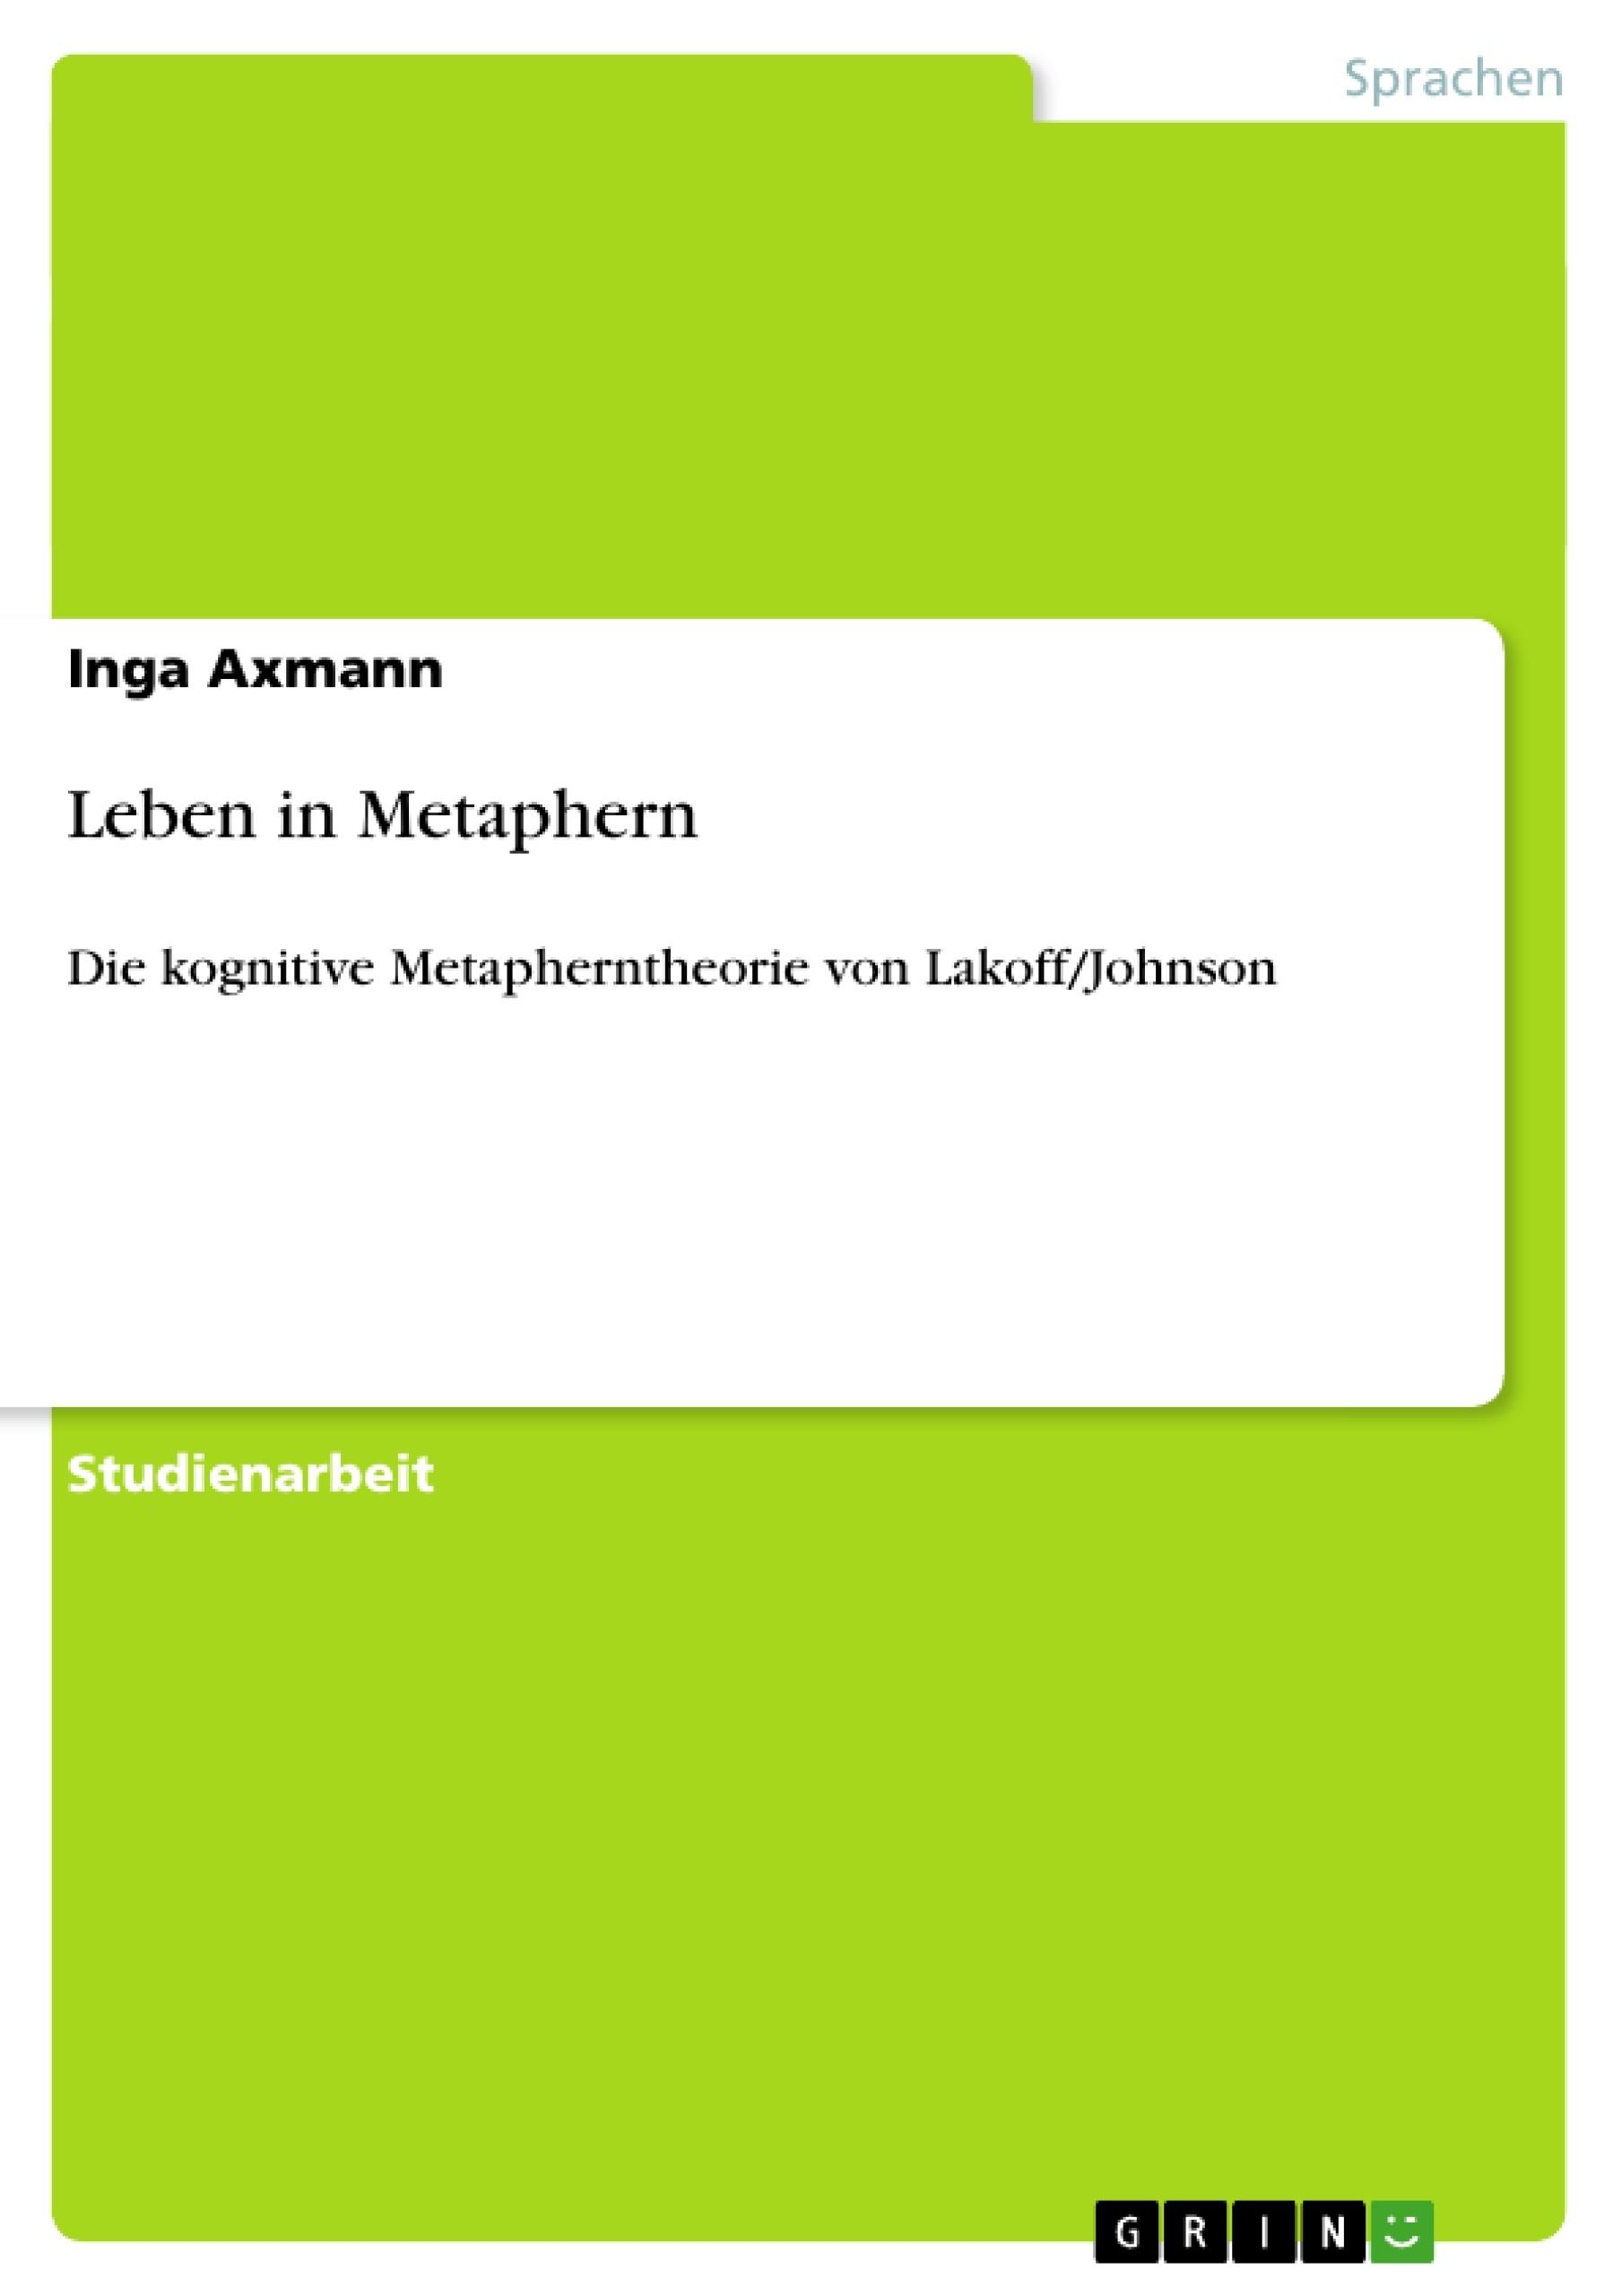 Titel: Leben in Metaphern